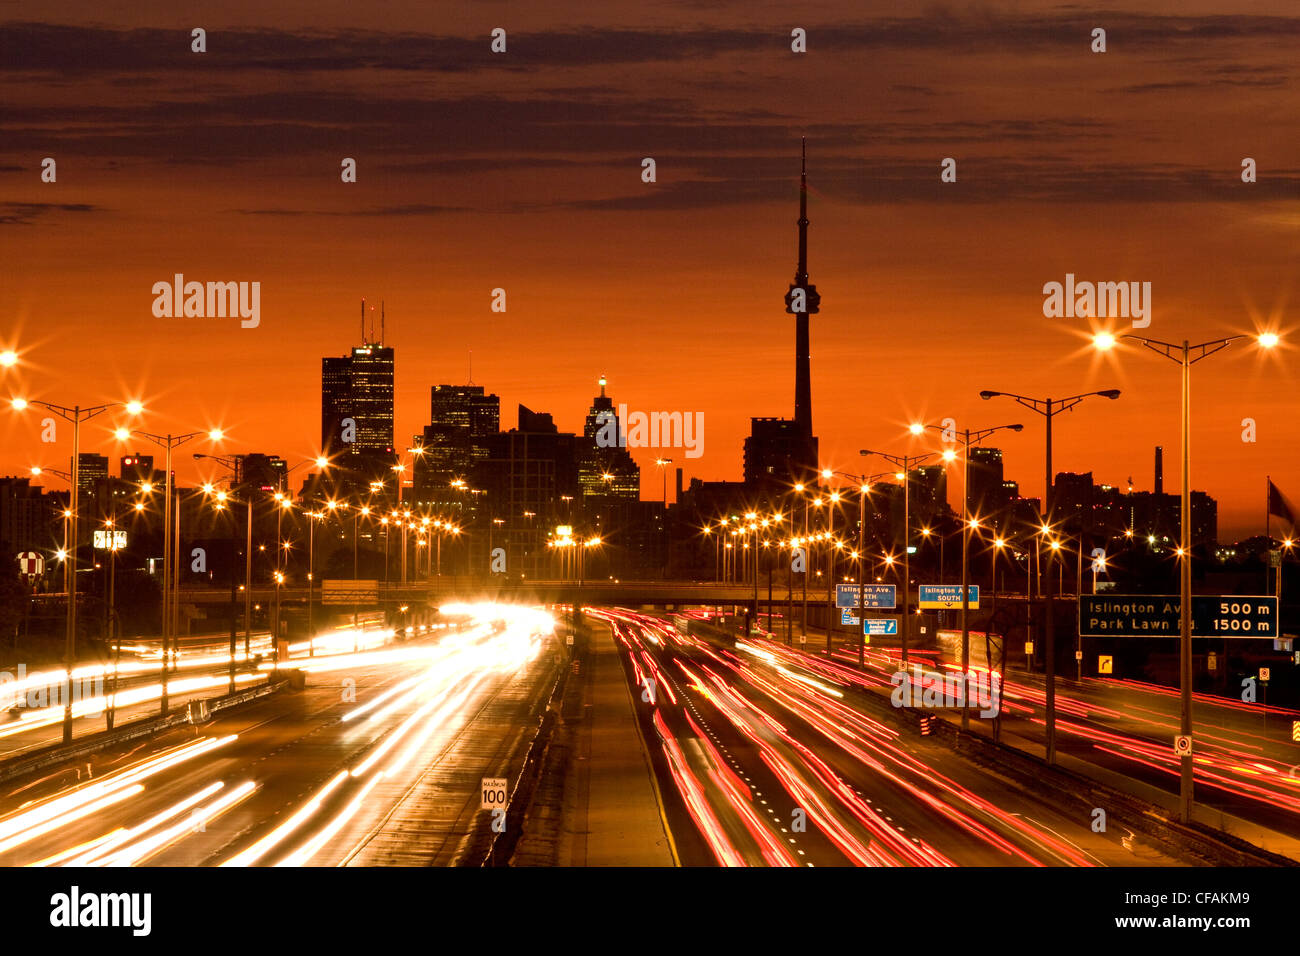 Horizonte de Toronto y QEW carretera con tráfico matutino, Toronto, Ontario, Canadá. Imagen De Stock